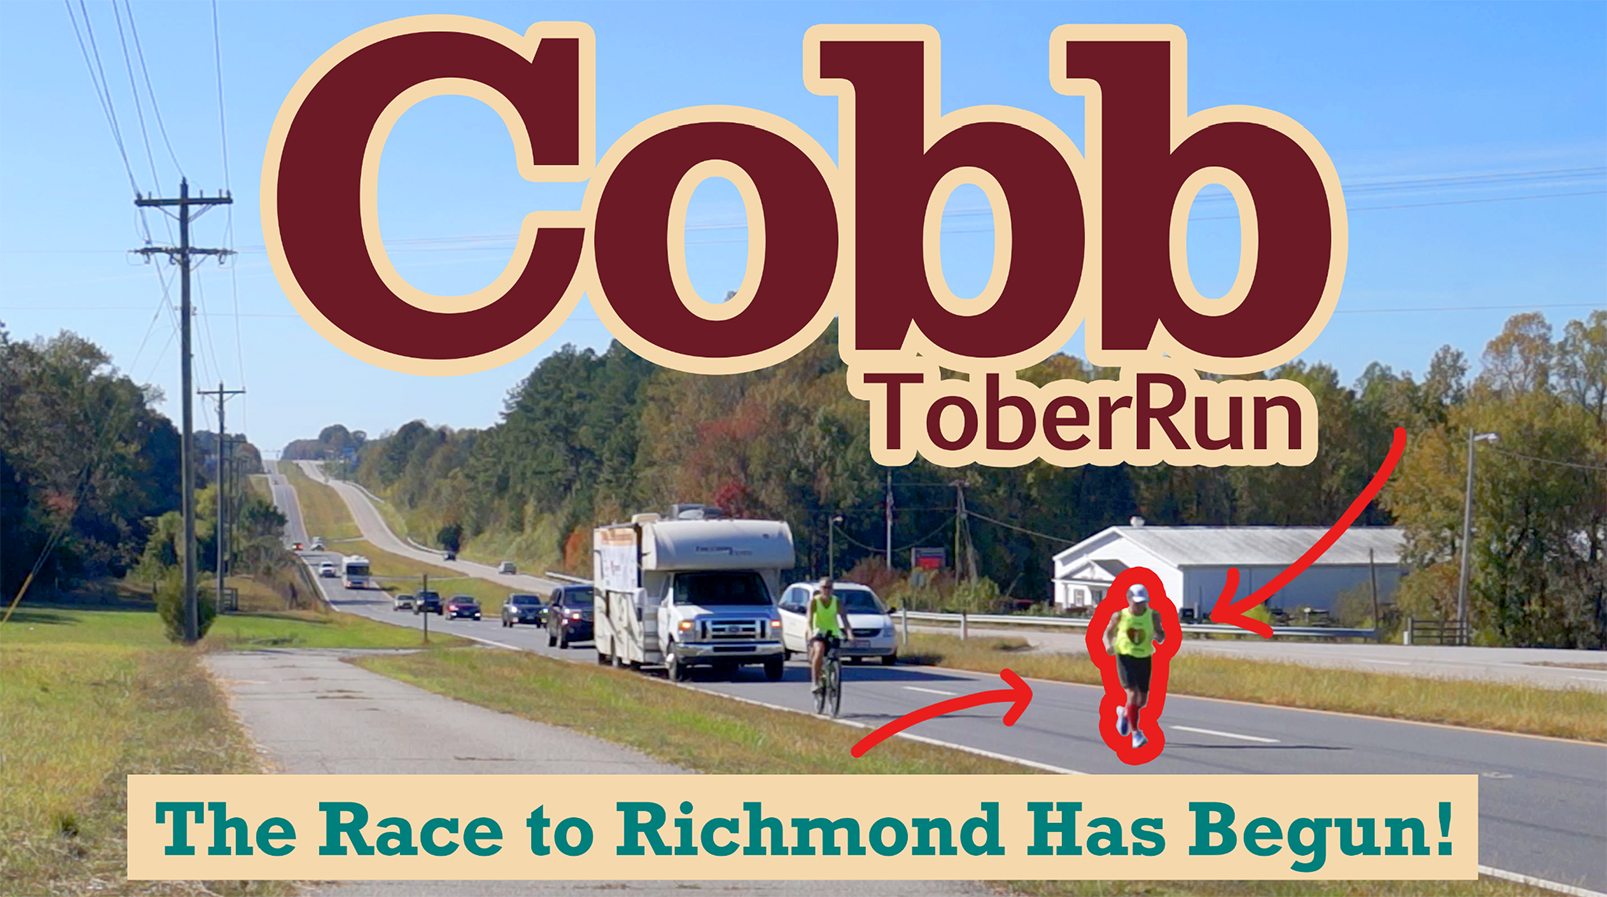 CobbtoberRun 2020: The Race to Richmond Has Begun!